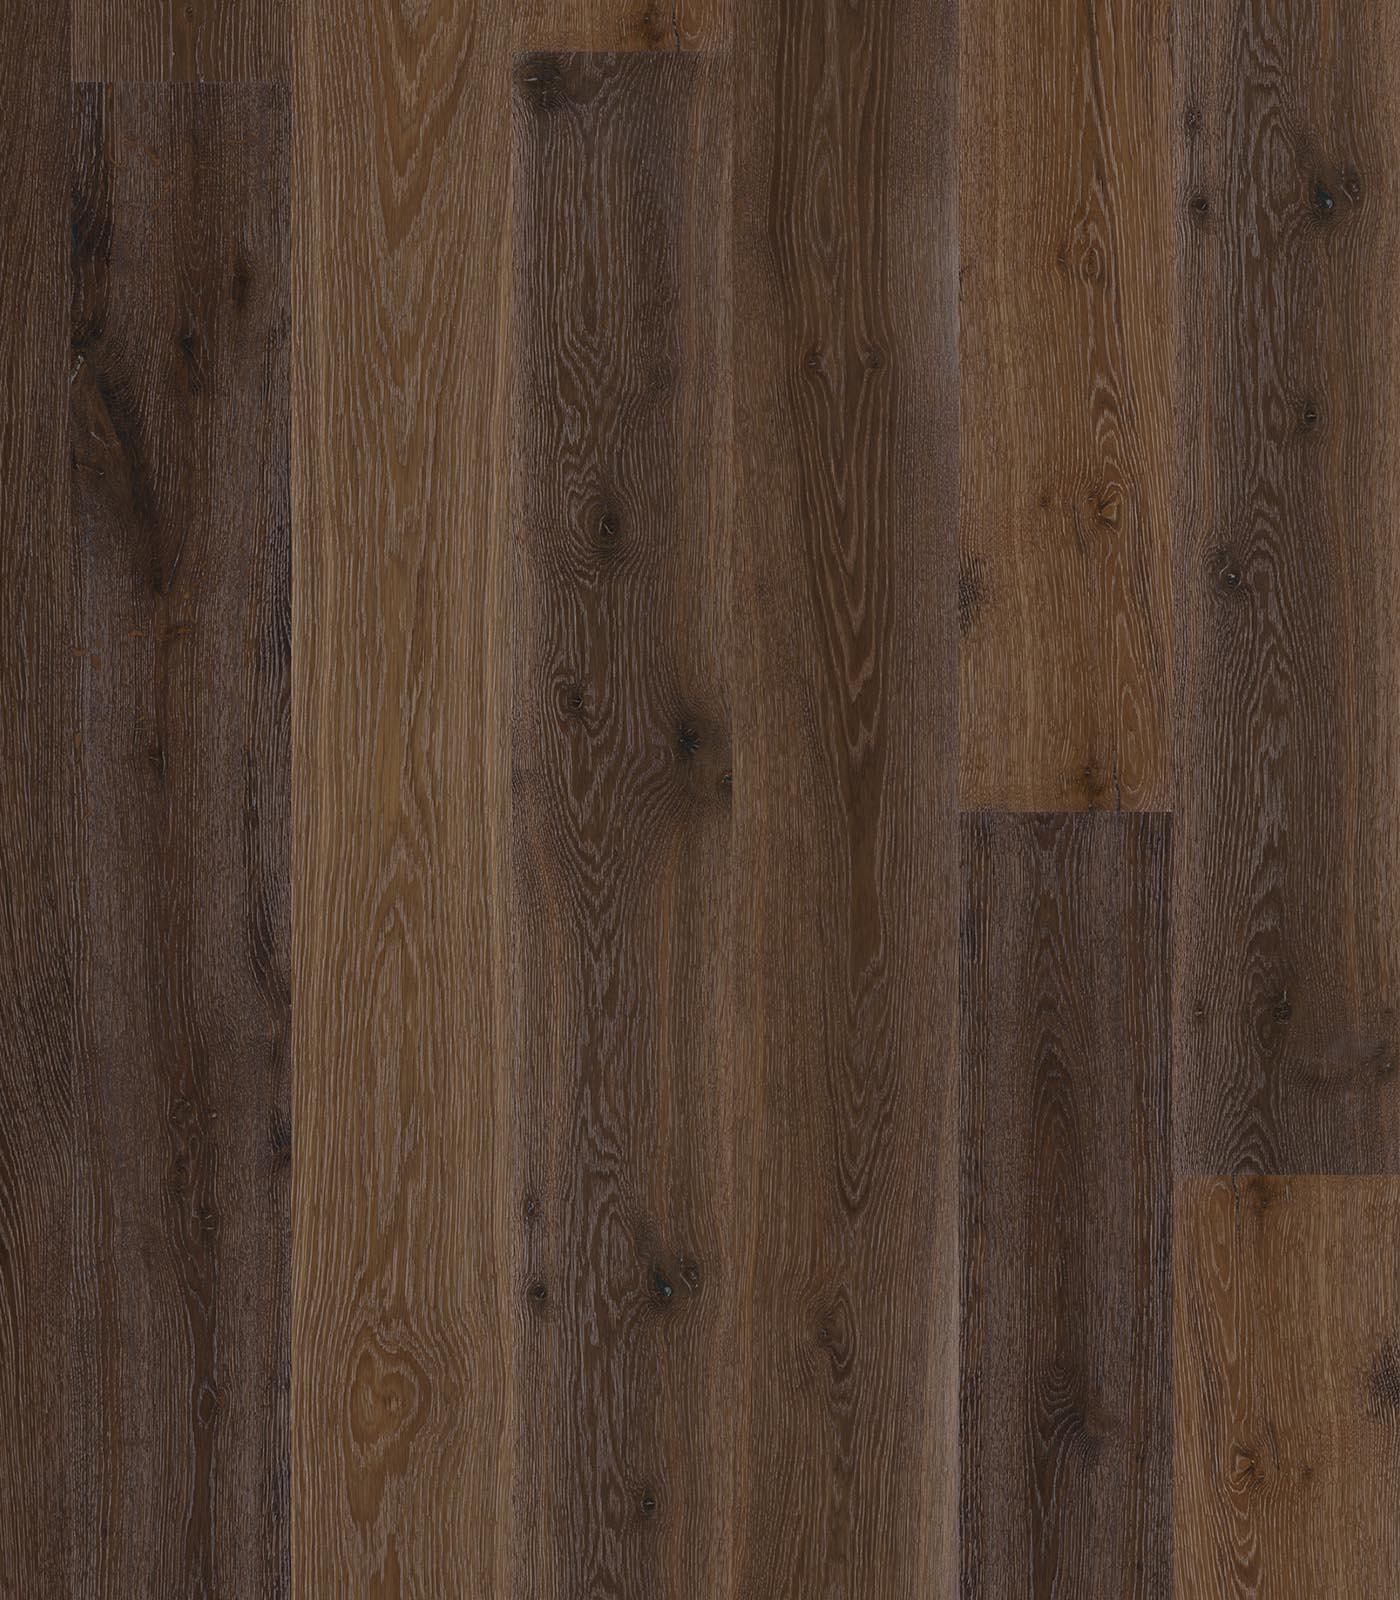 Laurentians-European engineered floors Oak-flat